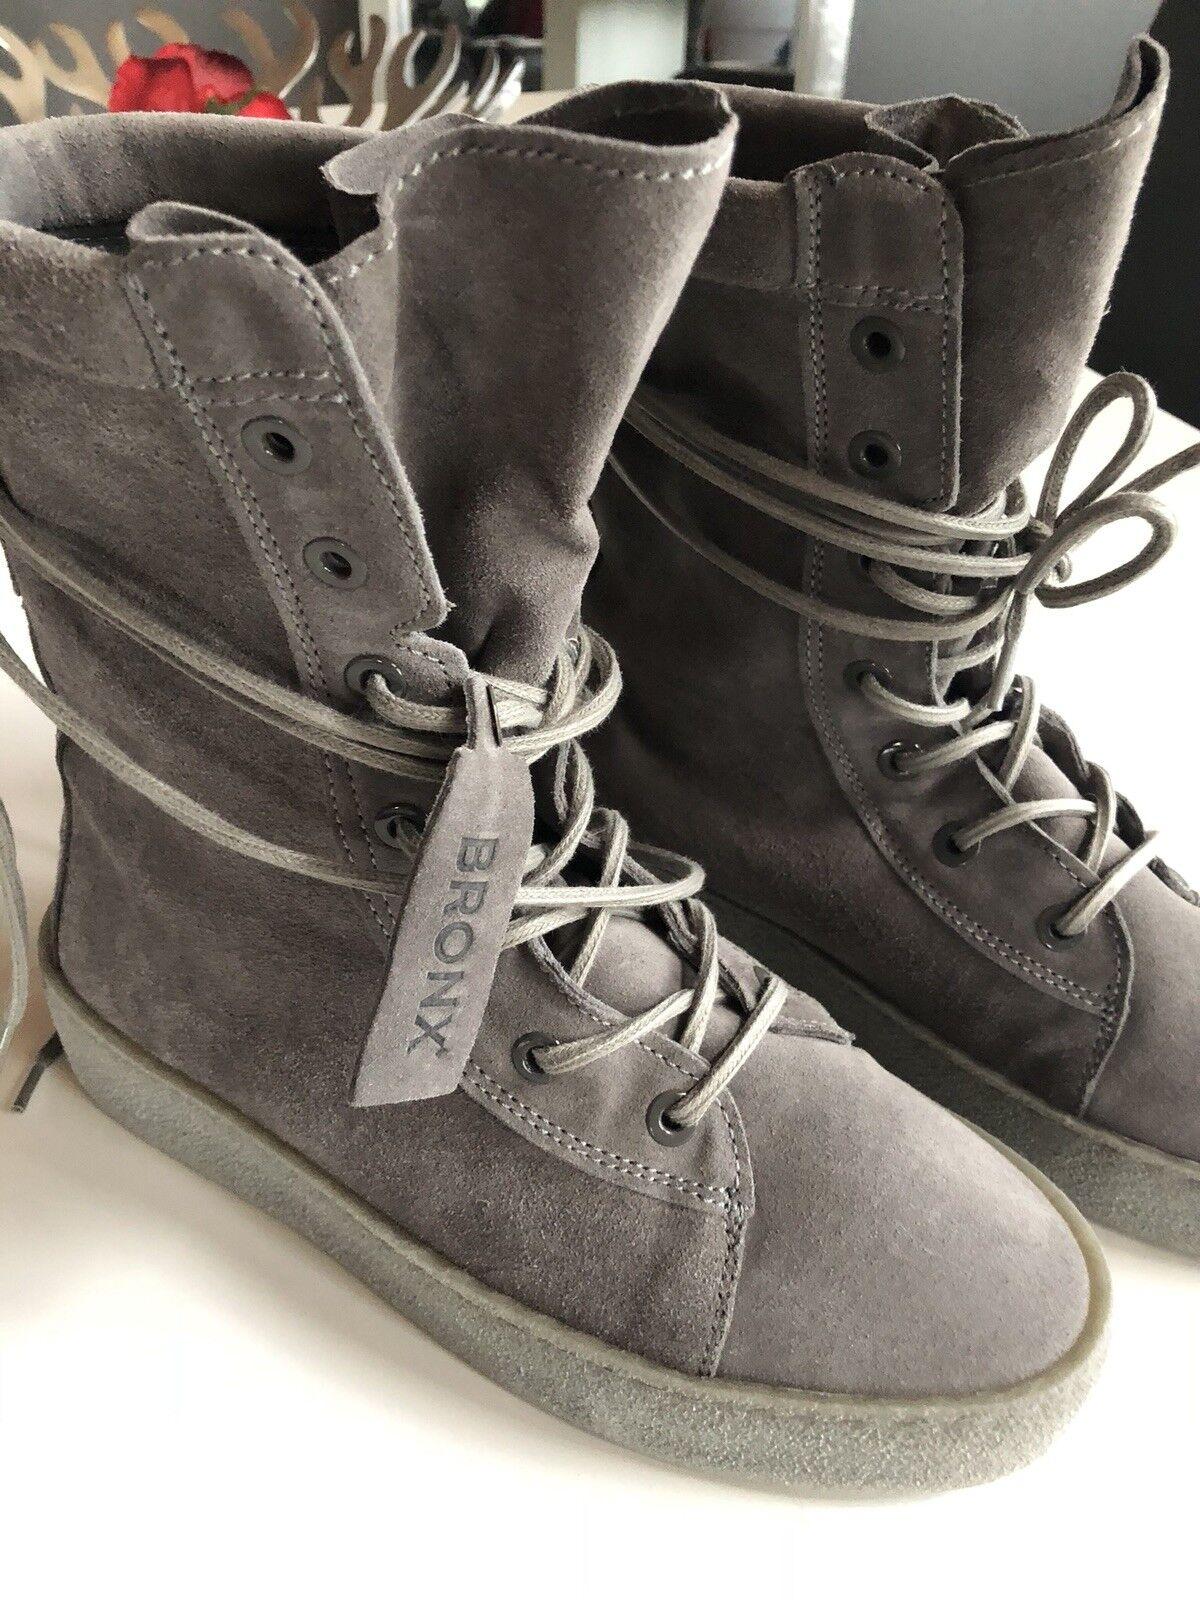 bronx neu stiefel Boots Größe 40 neu bronx grau a6f6b5